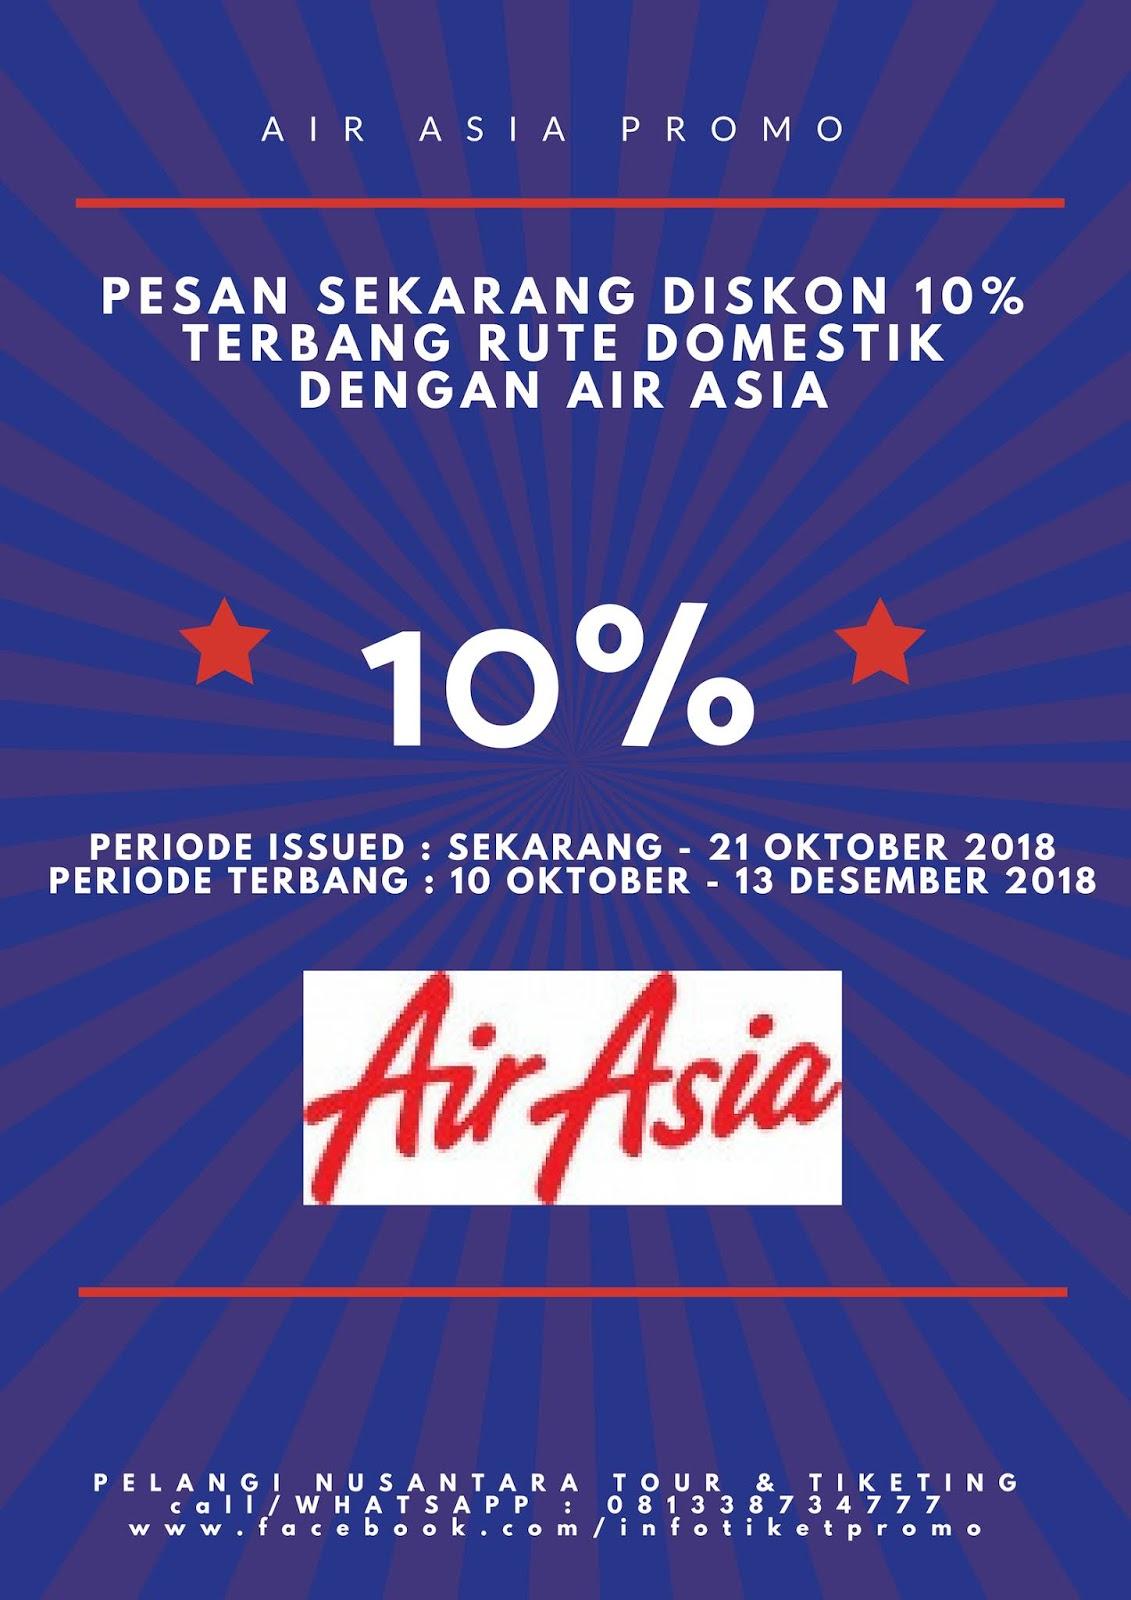 Pelangi Nusantara Tour Tiket Pesawat Murah Air Asia Diskon 10 Airasia Terbang Domestik Call 081338734777